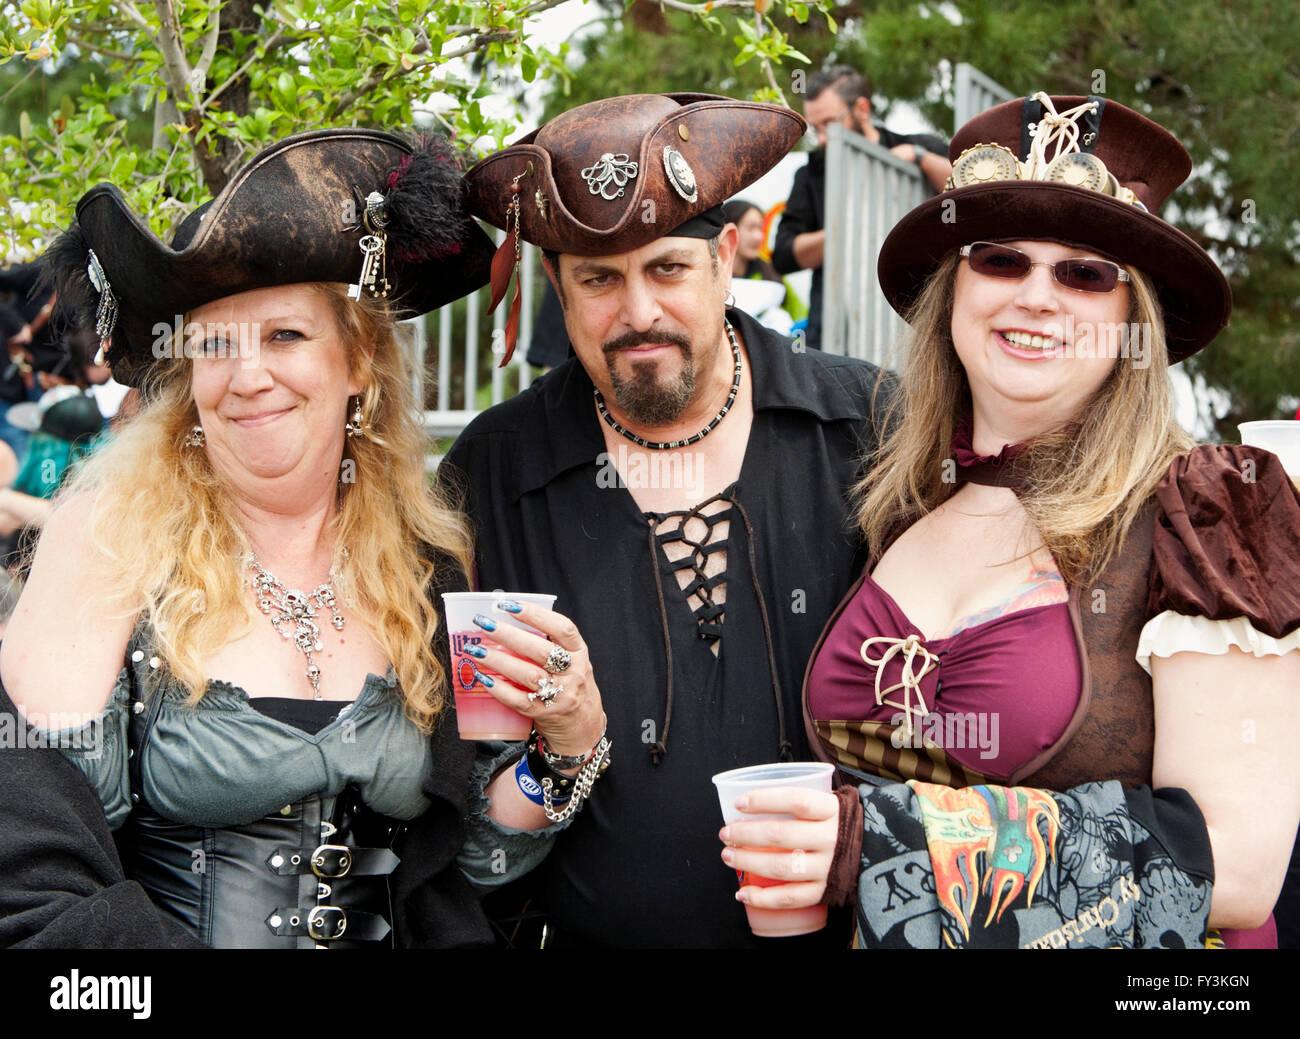 Participants dressed as pirates at the Las Vegas Pirate Fest  at Lorenzi Park April 8-9-10, 2016 - Stock Image